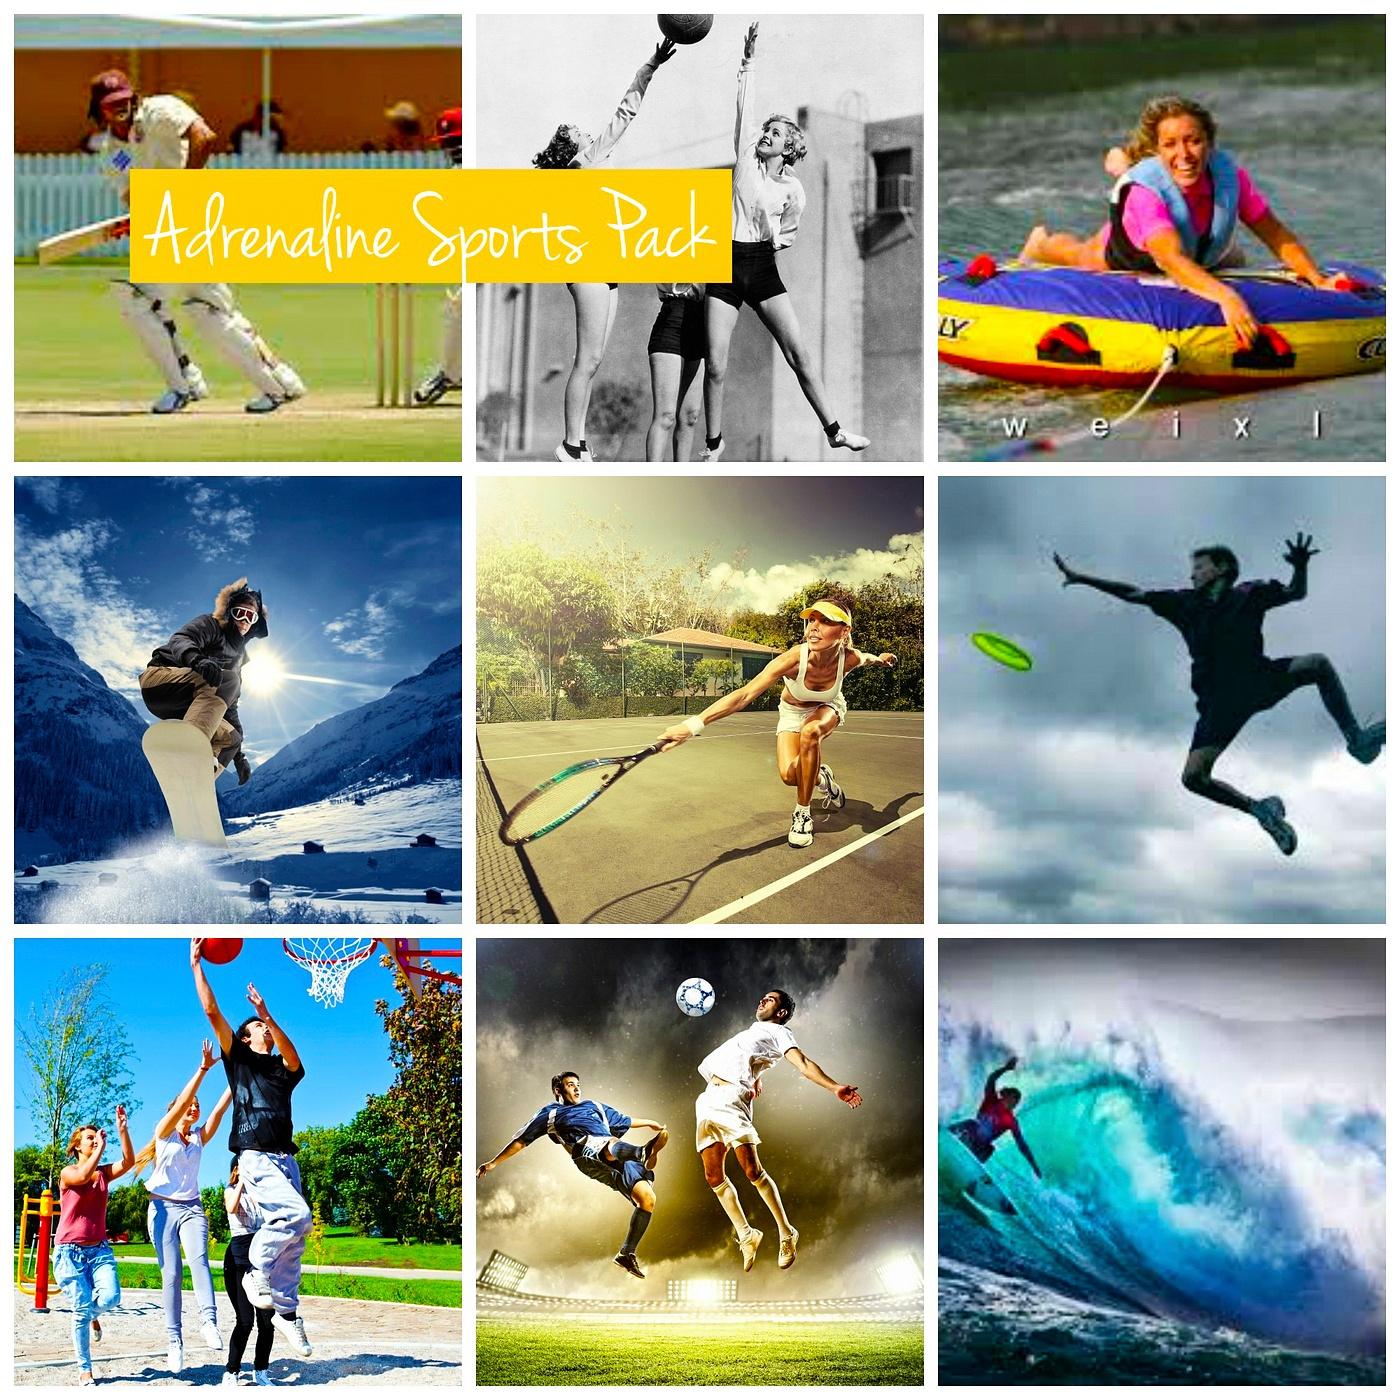 Adrenaline Sports Pack - 1